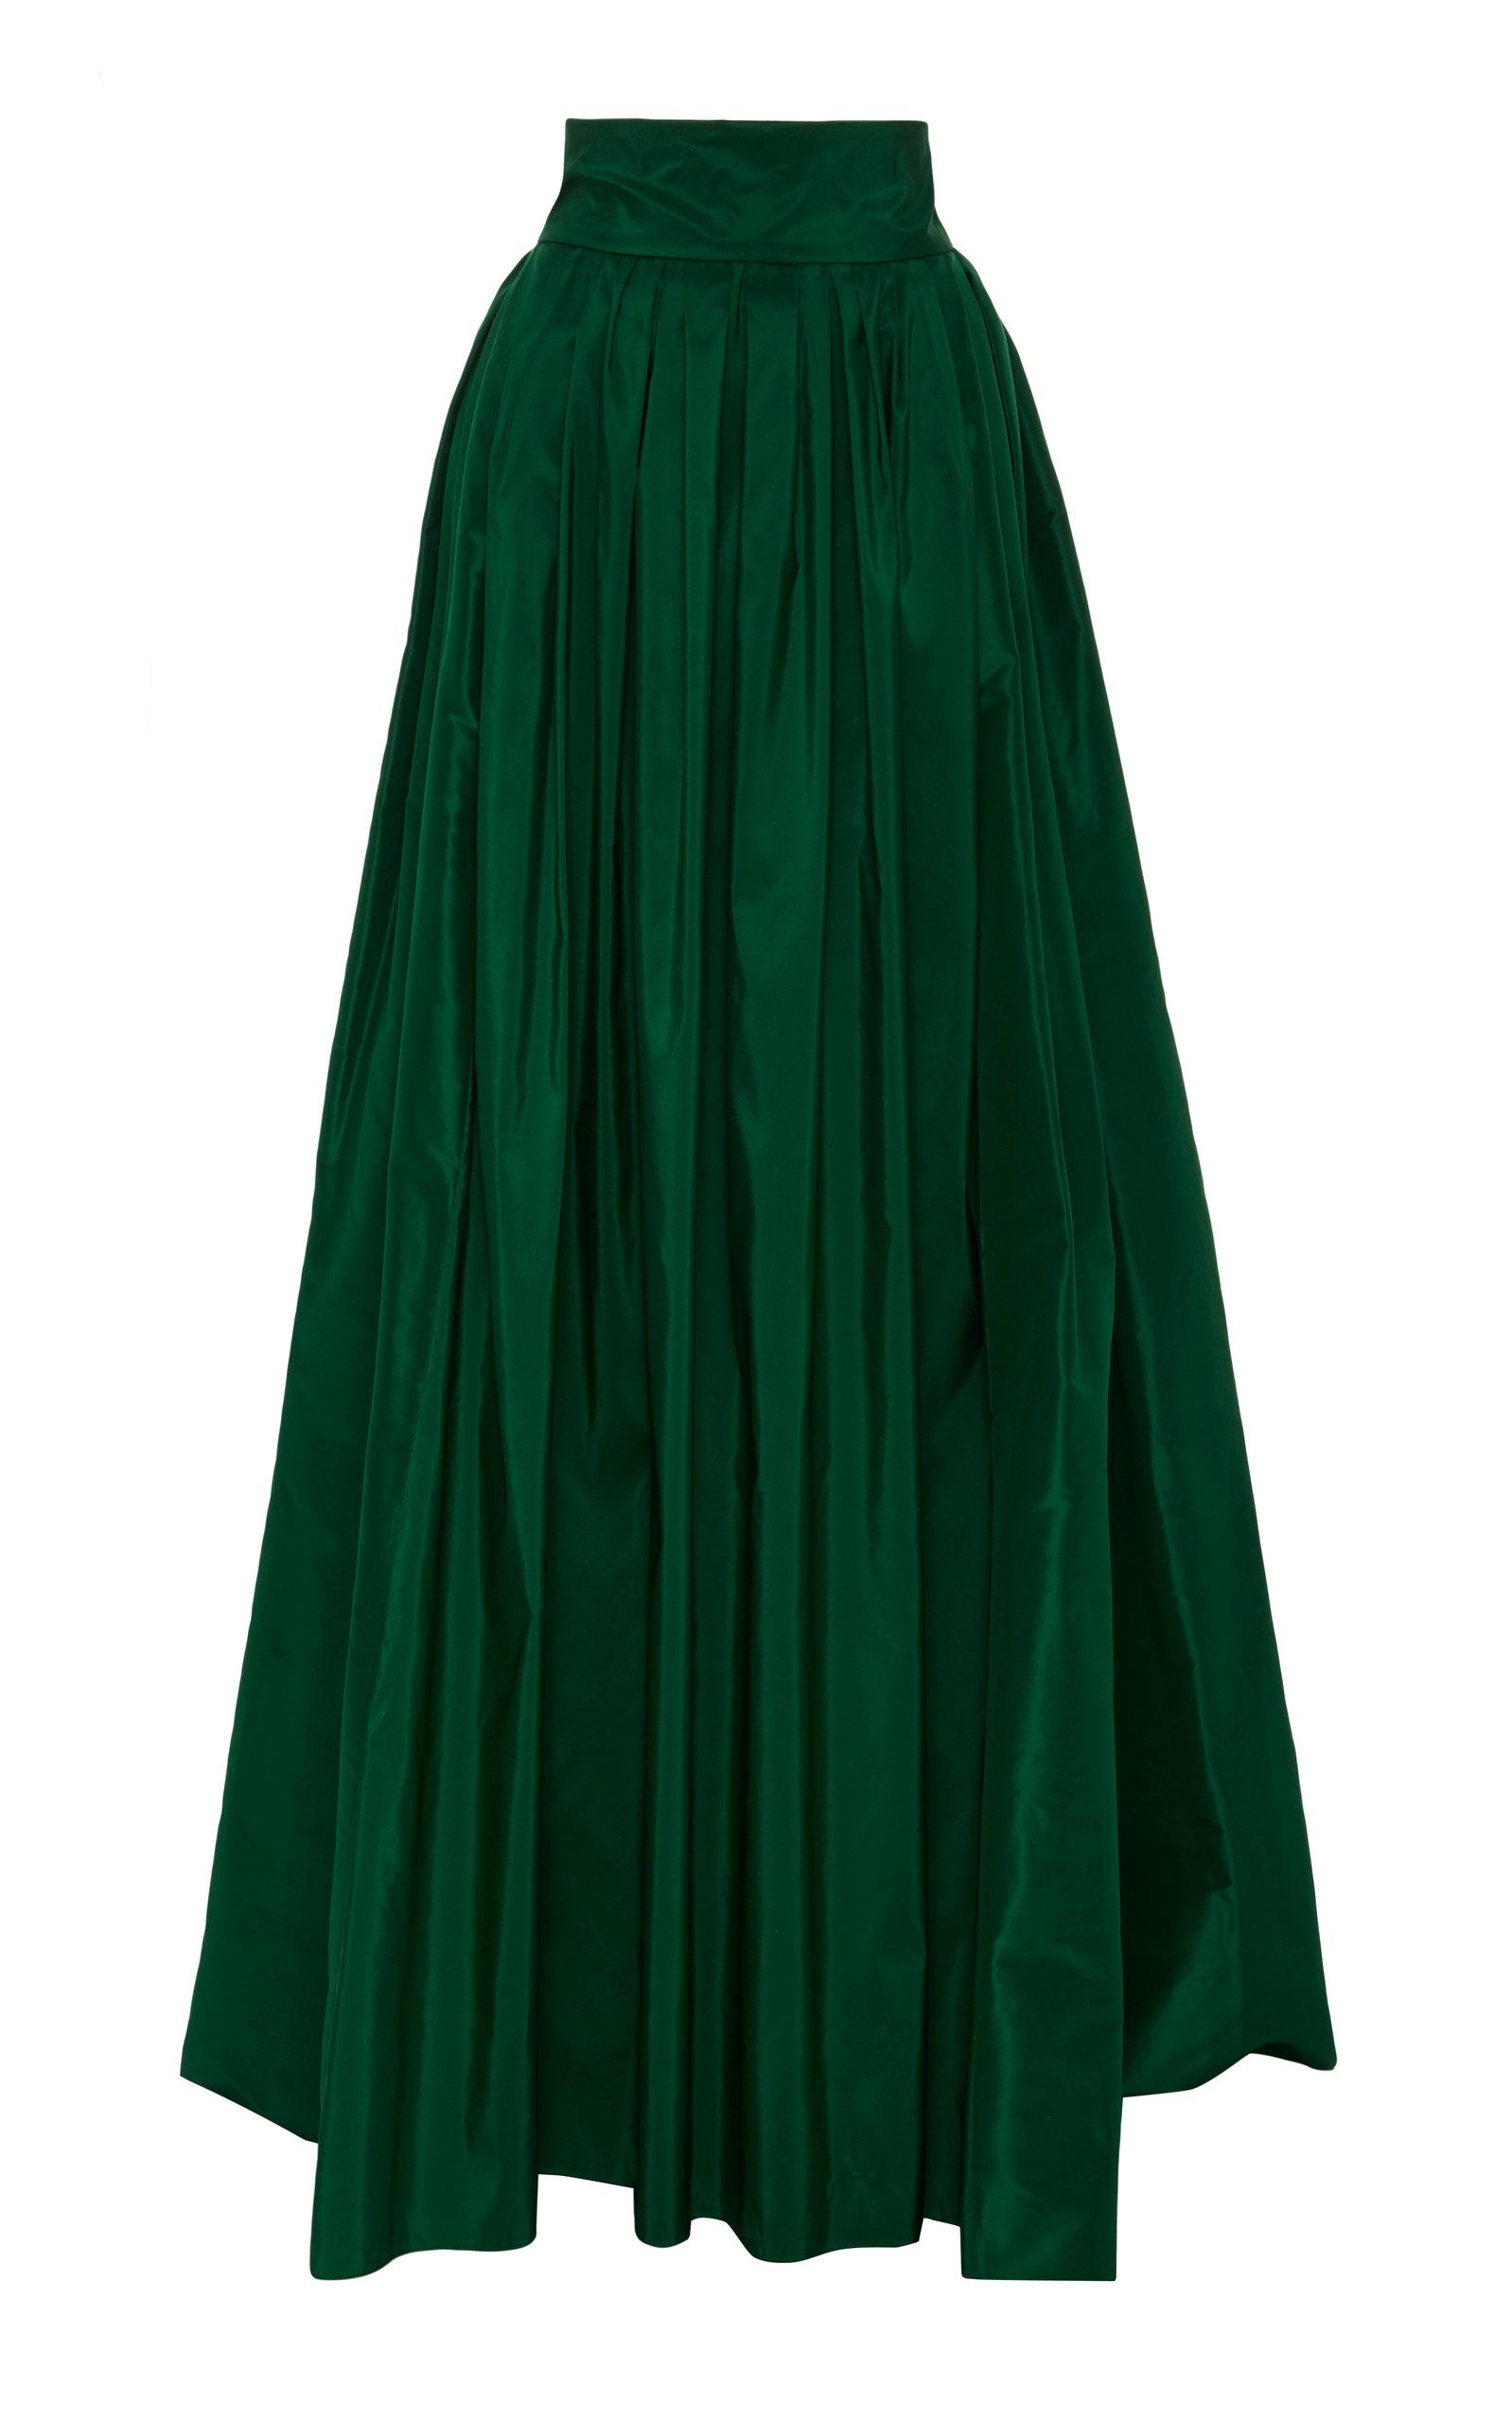 Carolina Herrera High Rise Silk Taffeta Ball Gown Skirt In Emerald